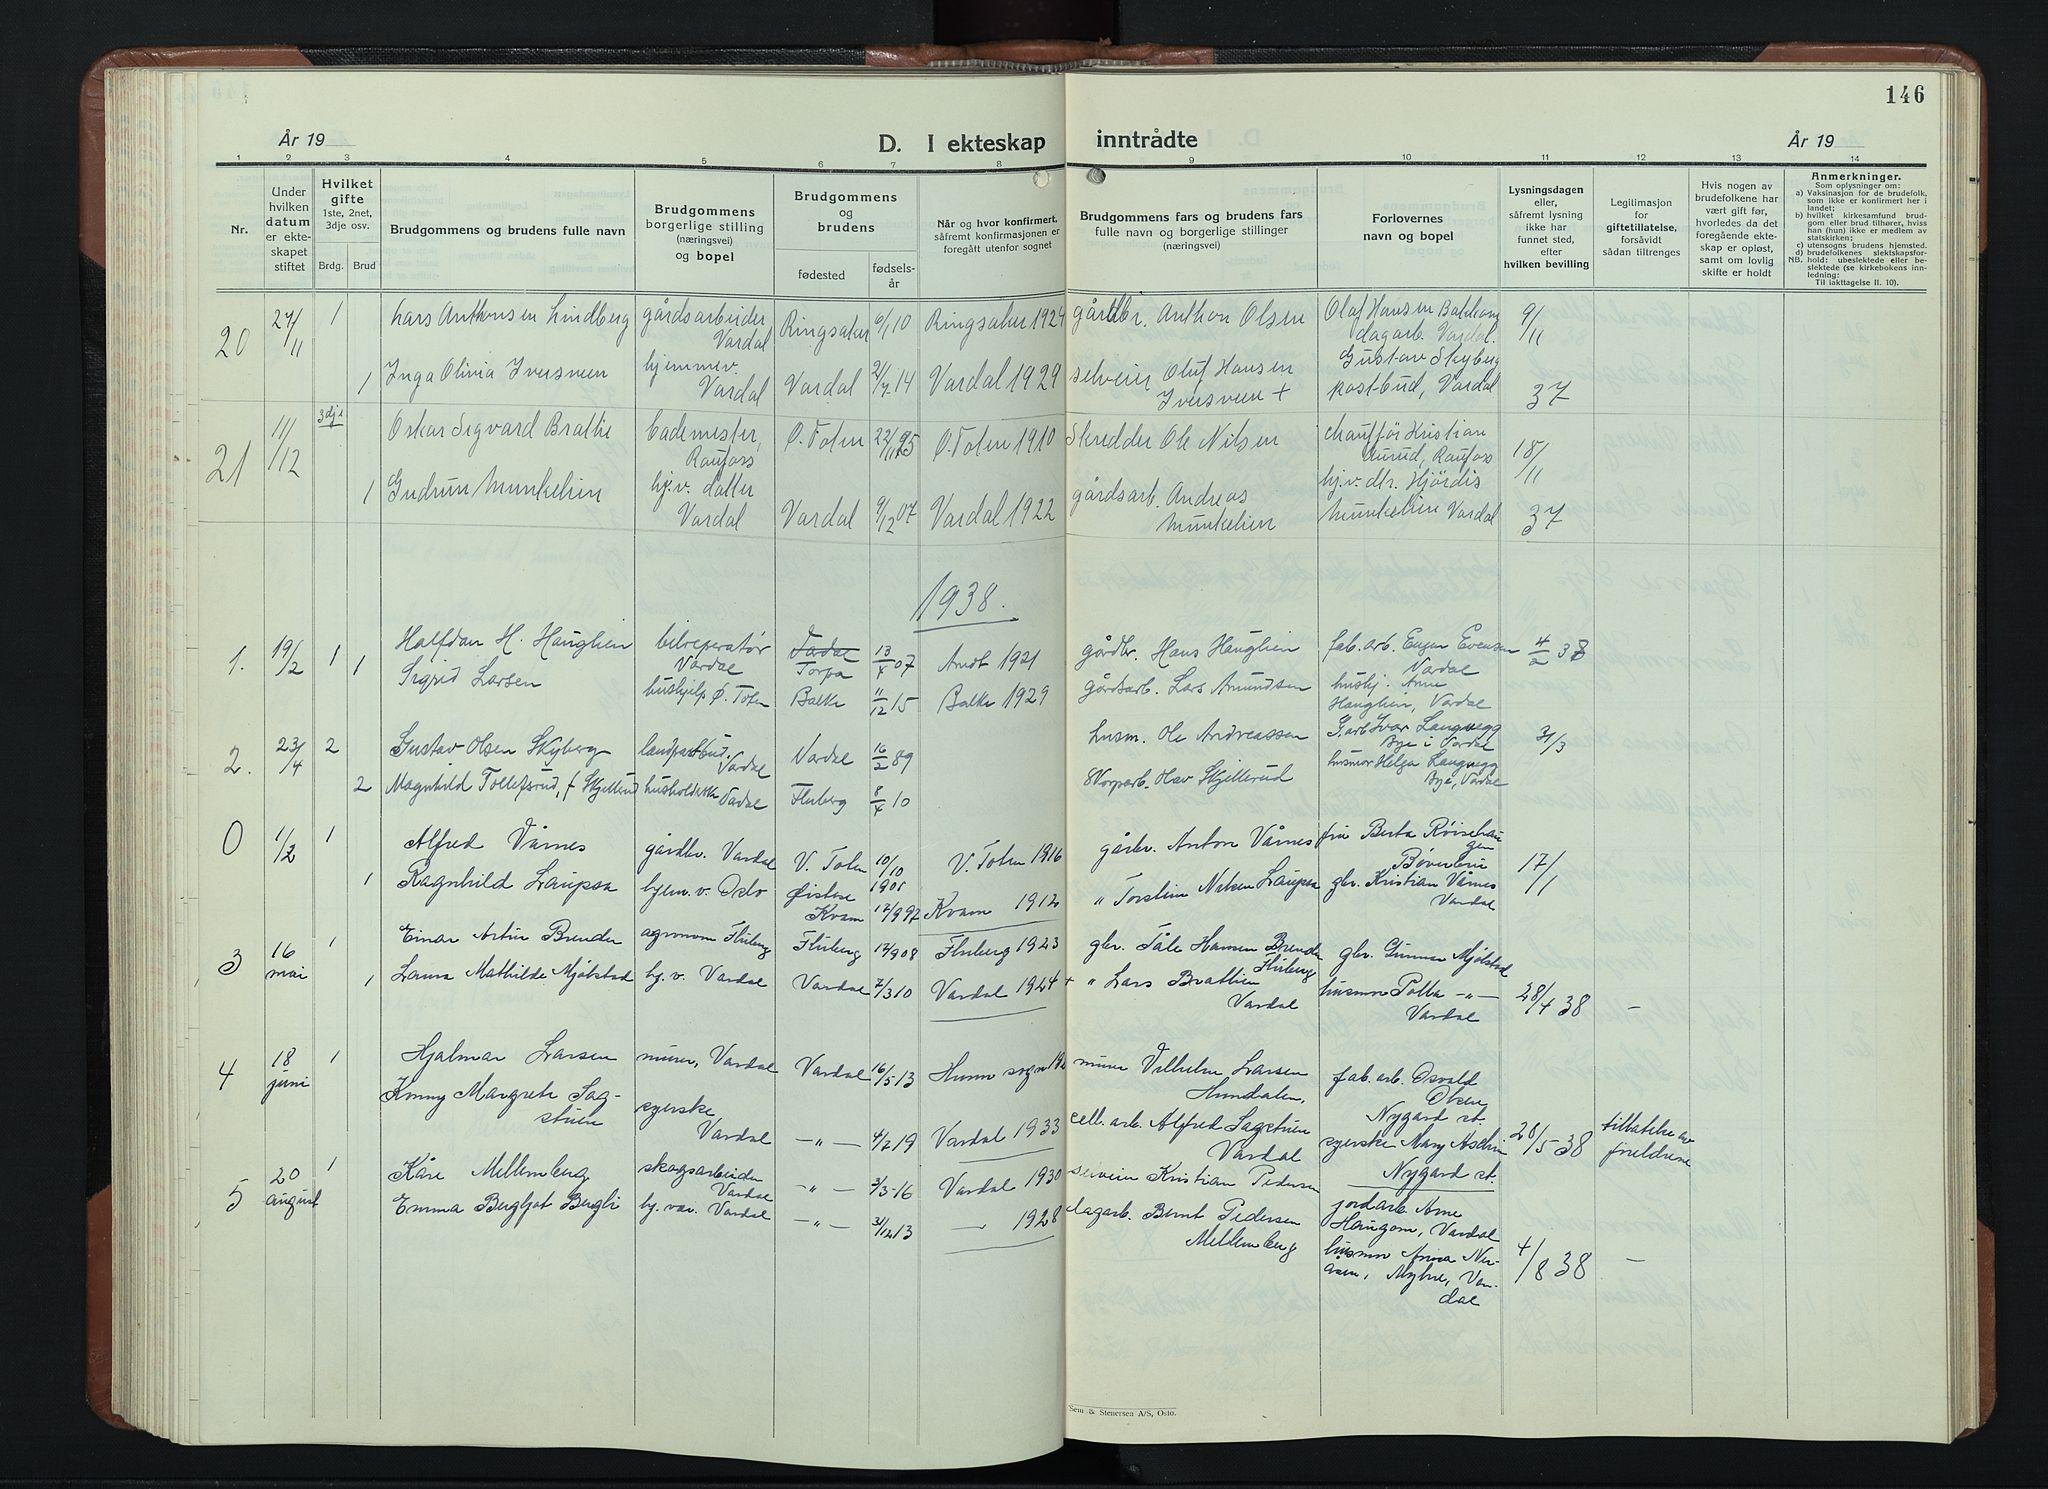 SAH, Vardal prestekontor, H/Ha/Hab/L0018: Klokkerbok nr. 18, 1931-1951, s. 146